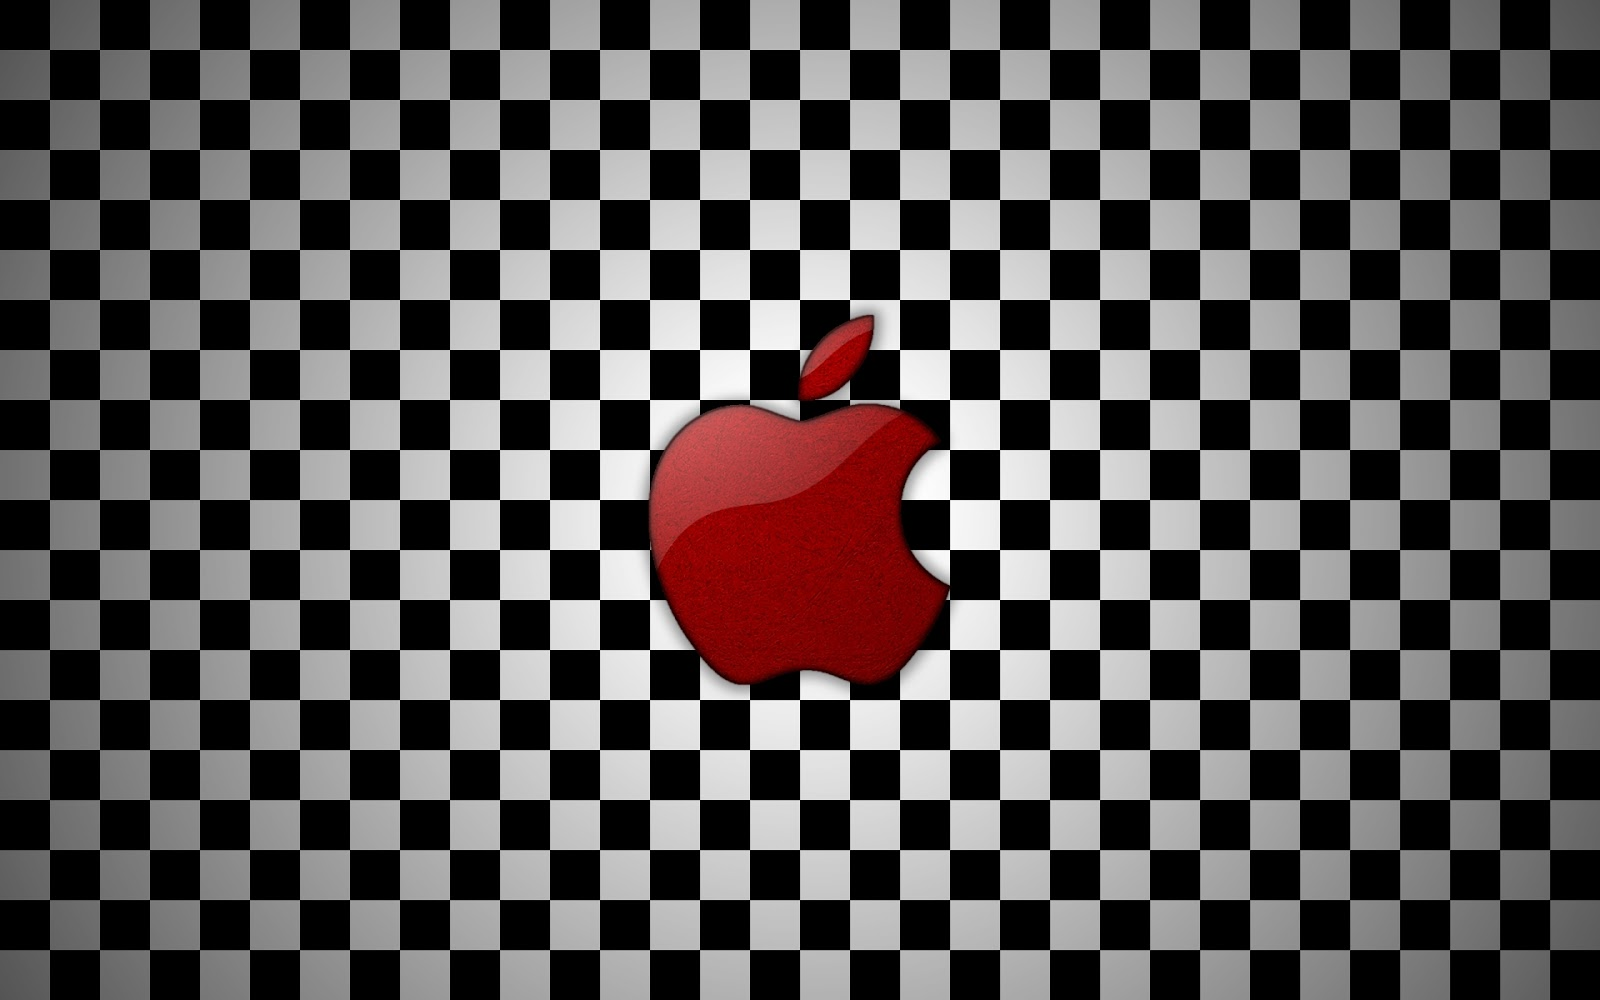 rakul preet singh hd wallpapers 1080p free download